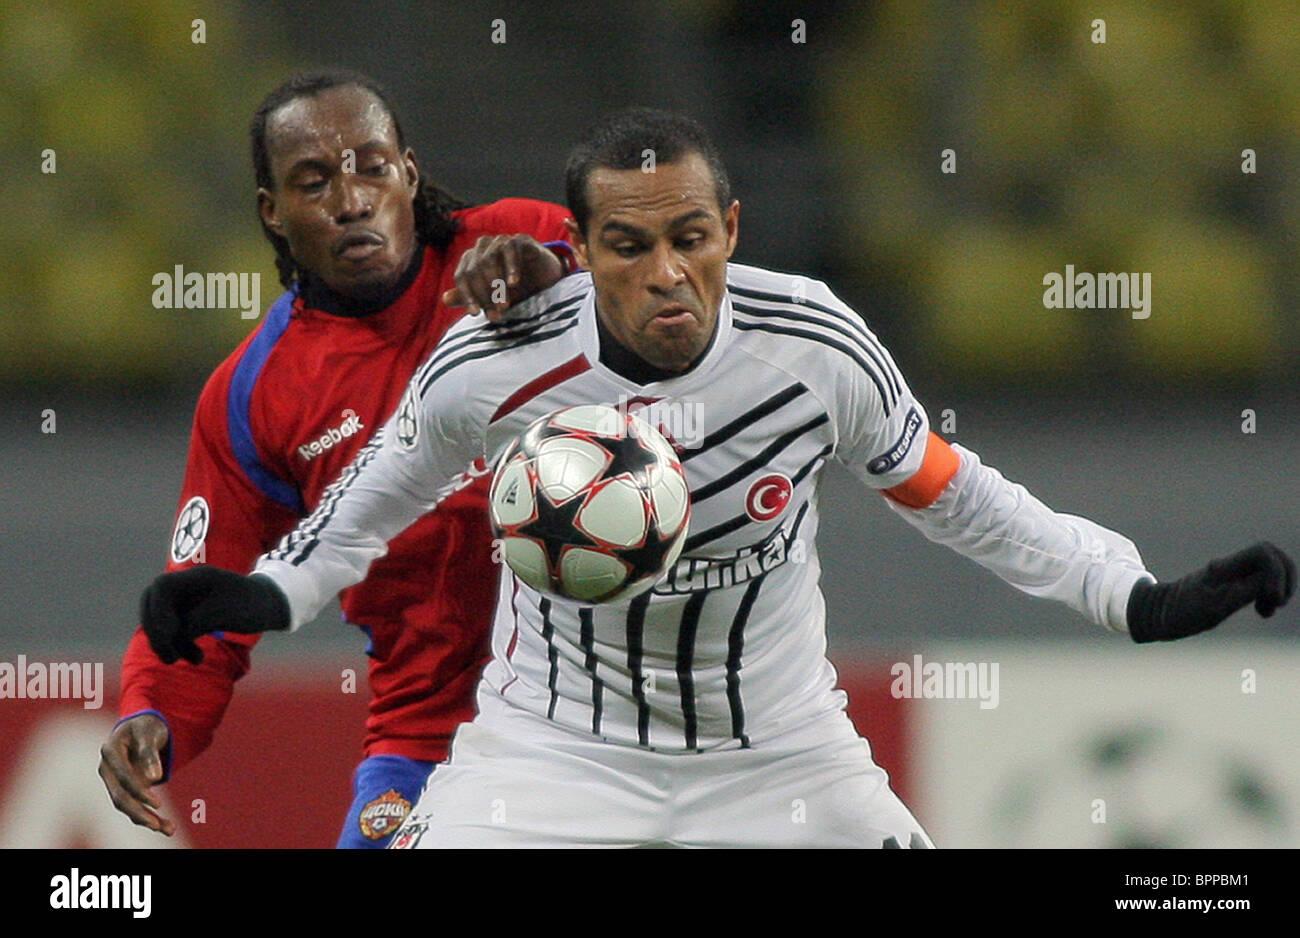 UEFA Champions League: CSKA Moscow vs Besiktas - Stock Image